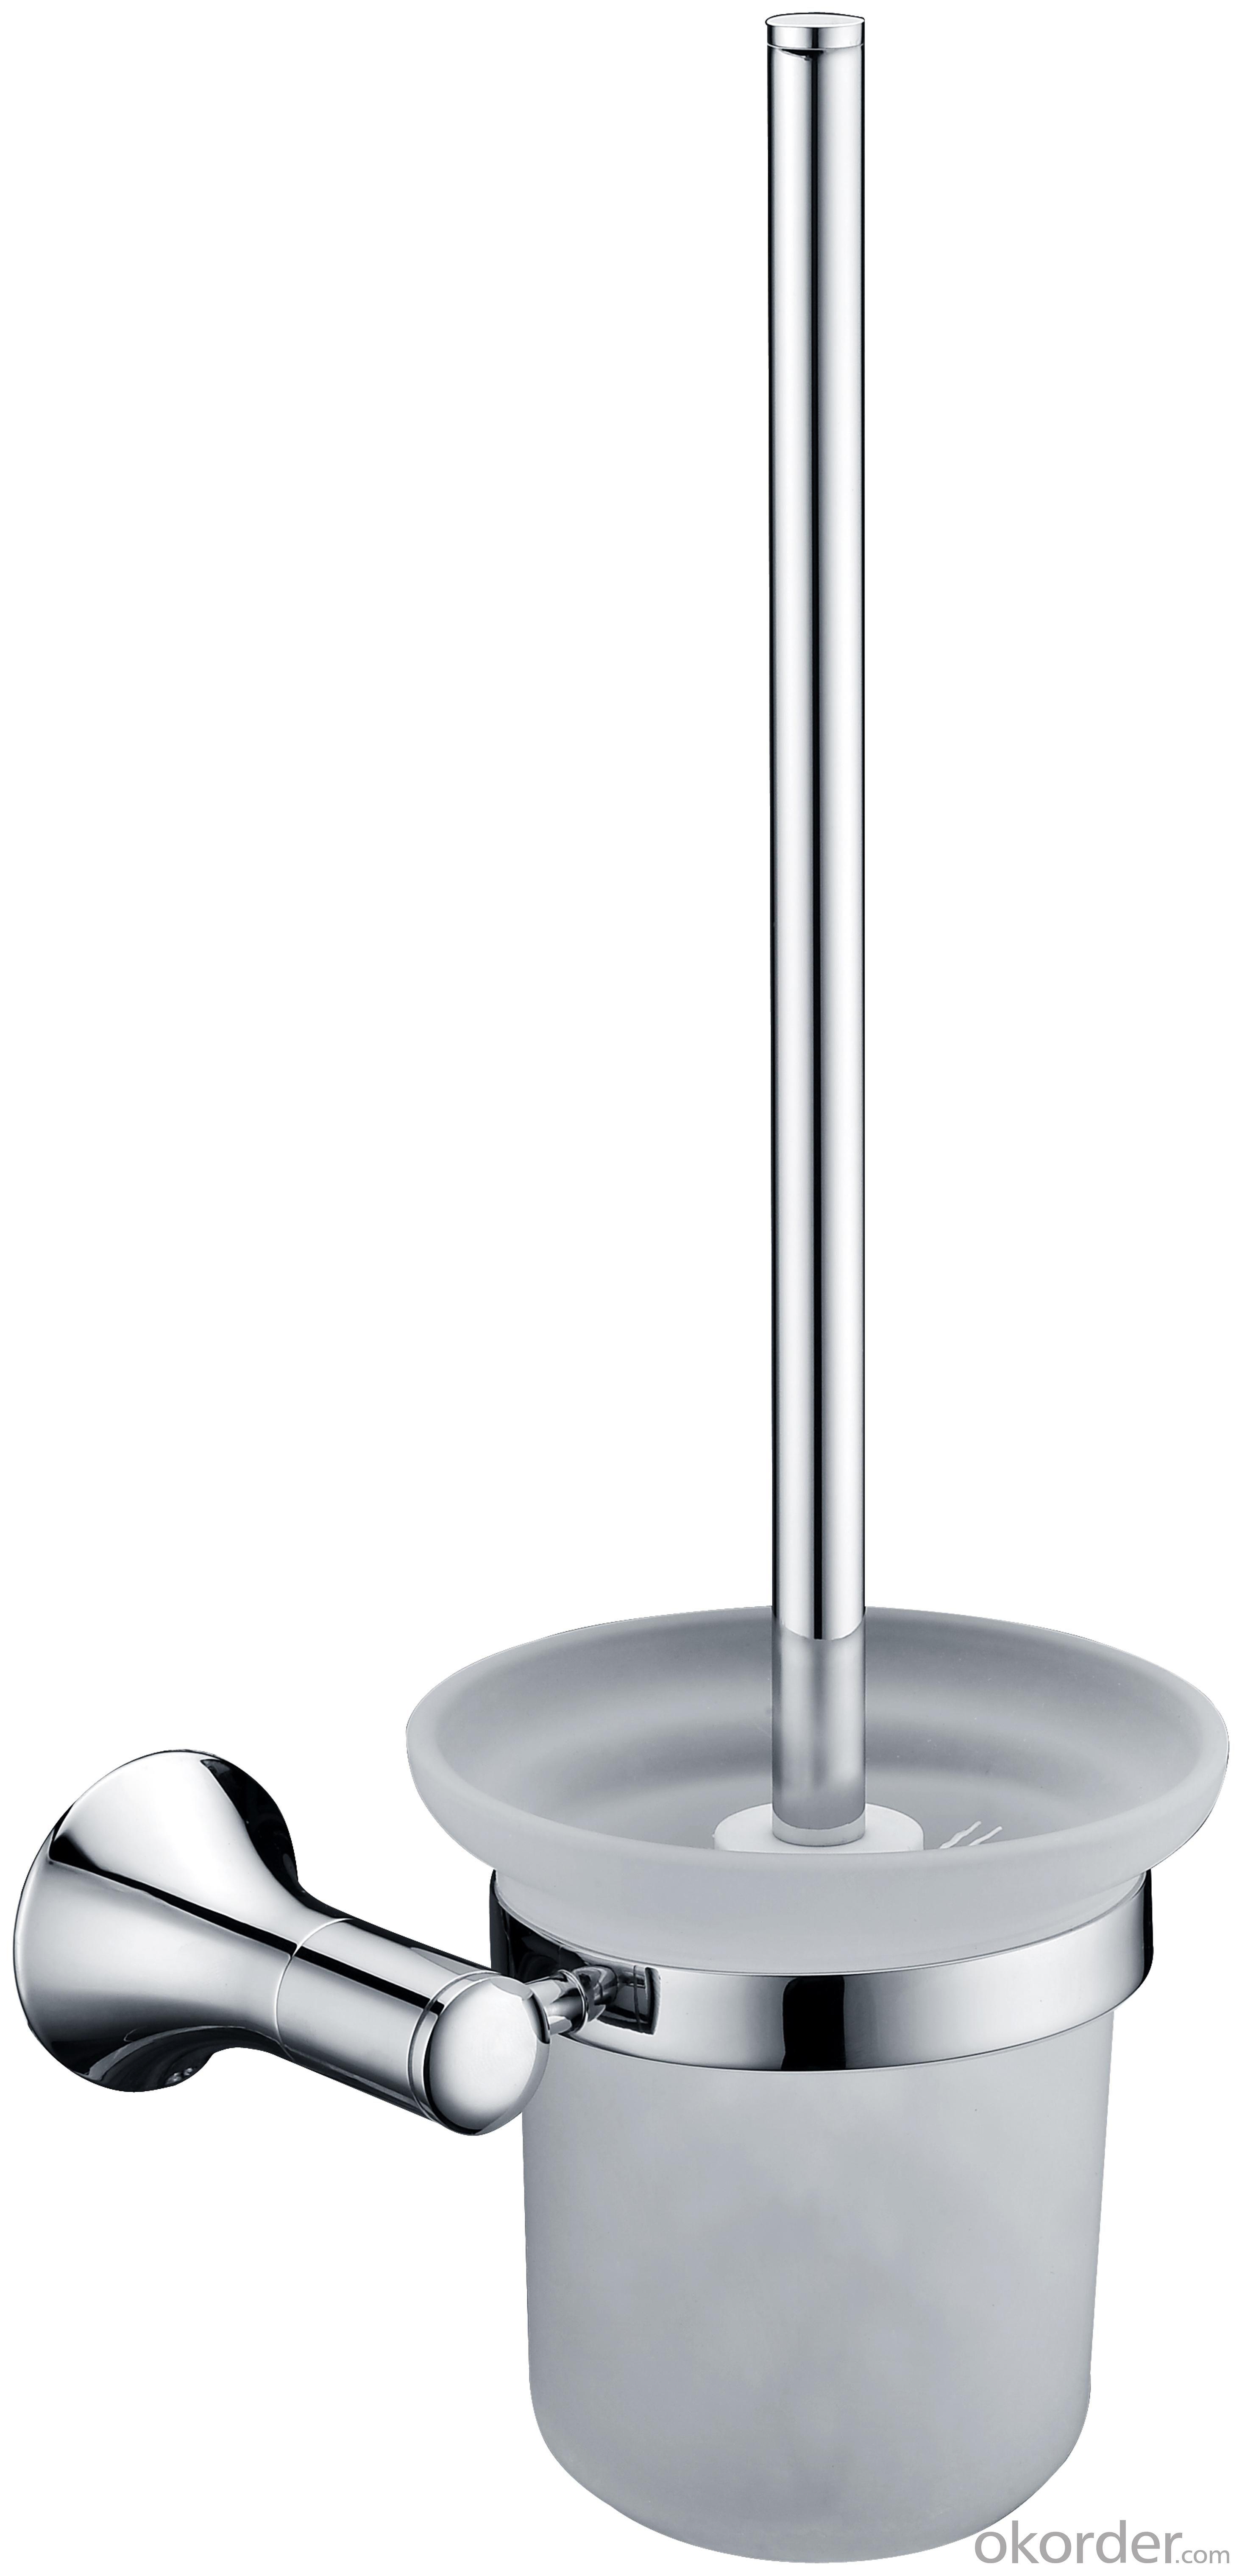 Decorative Exquisite Hardware House Bathroom Accessories Solid Brass Toilet Brush Holder